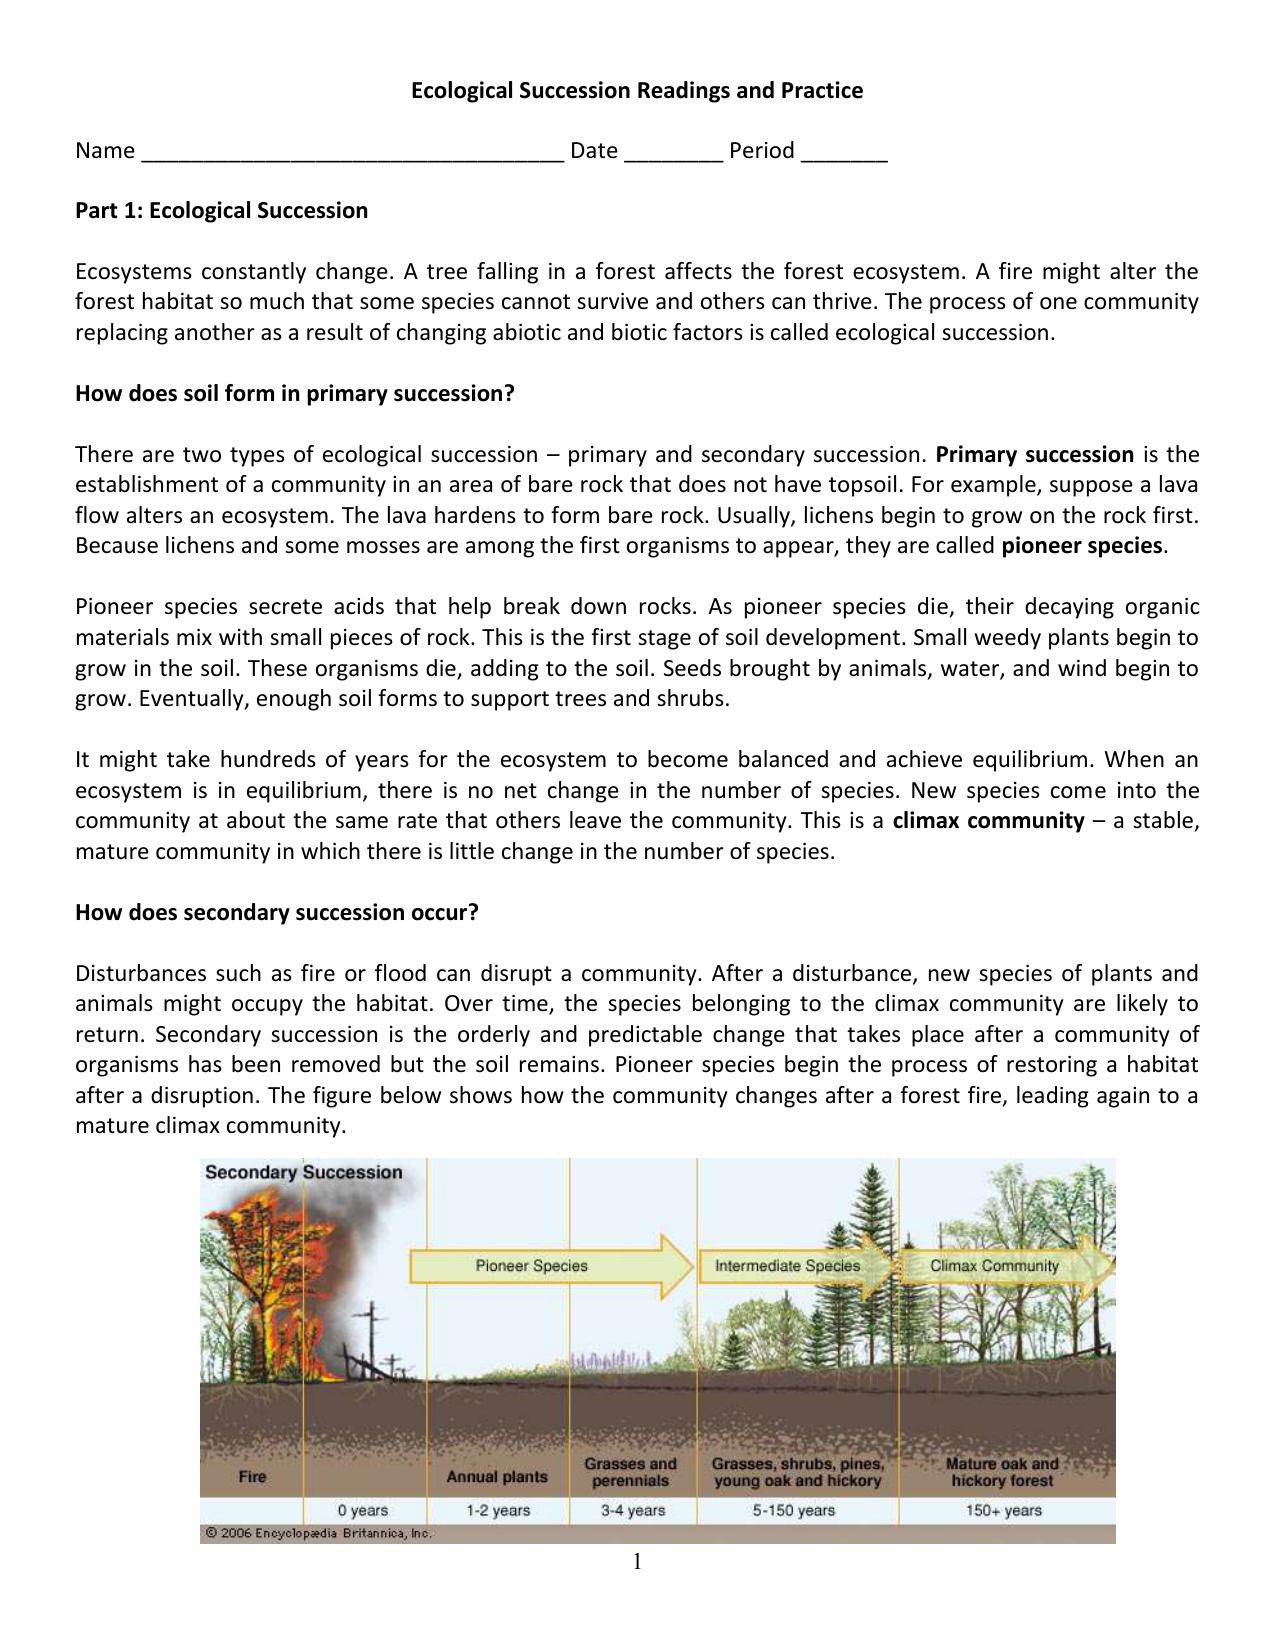 Ecological Succession Worksheet Answer Key